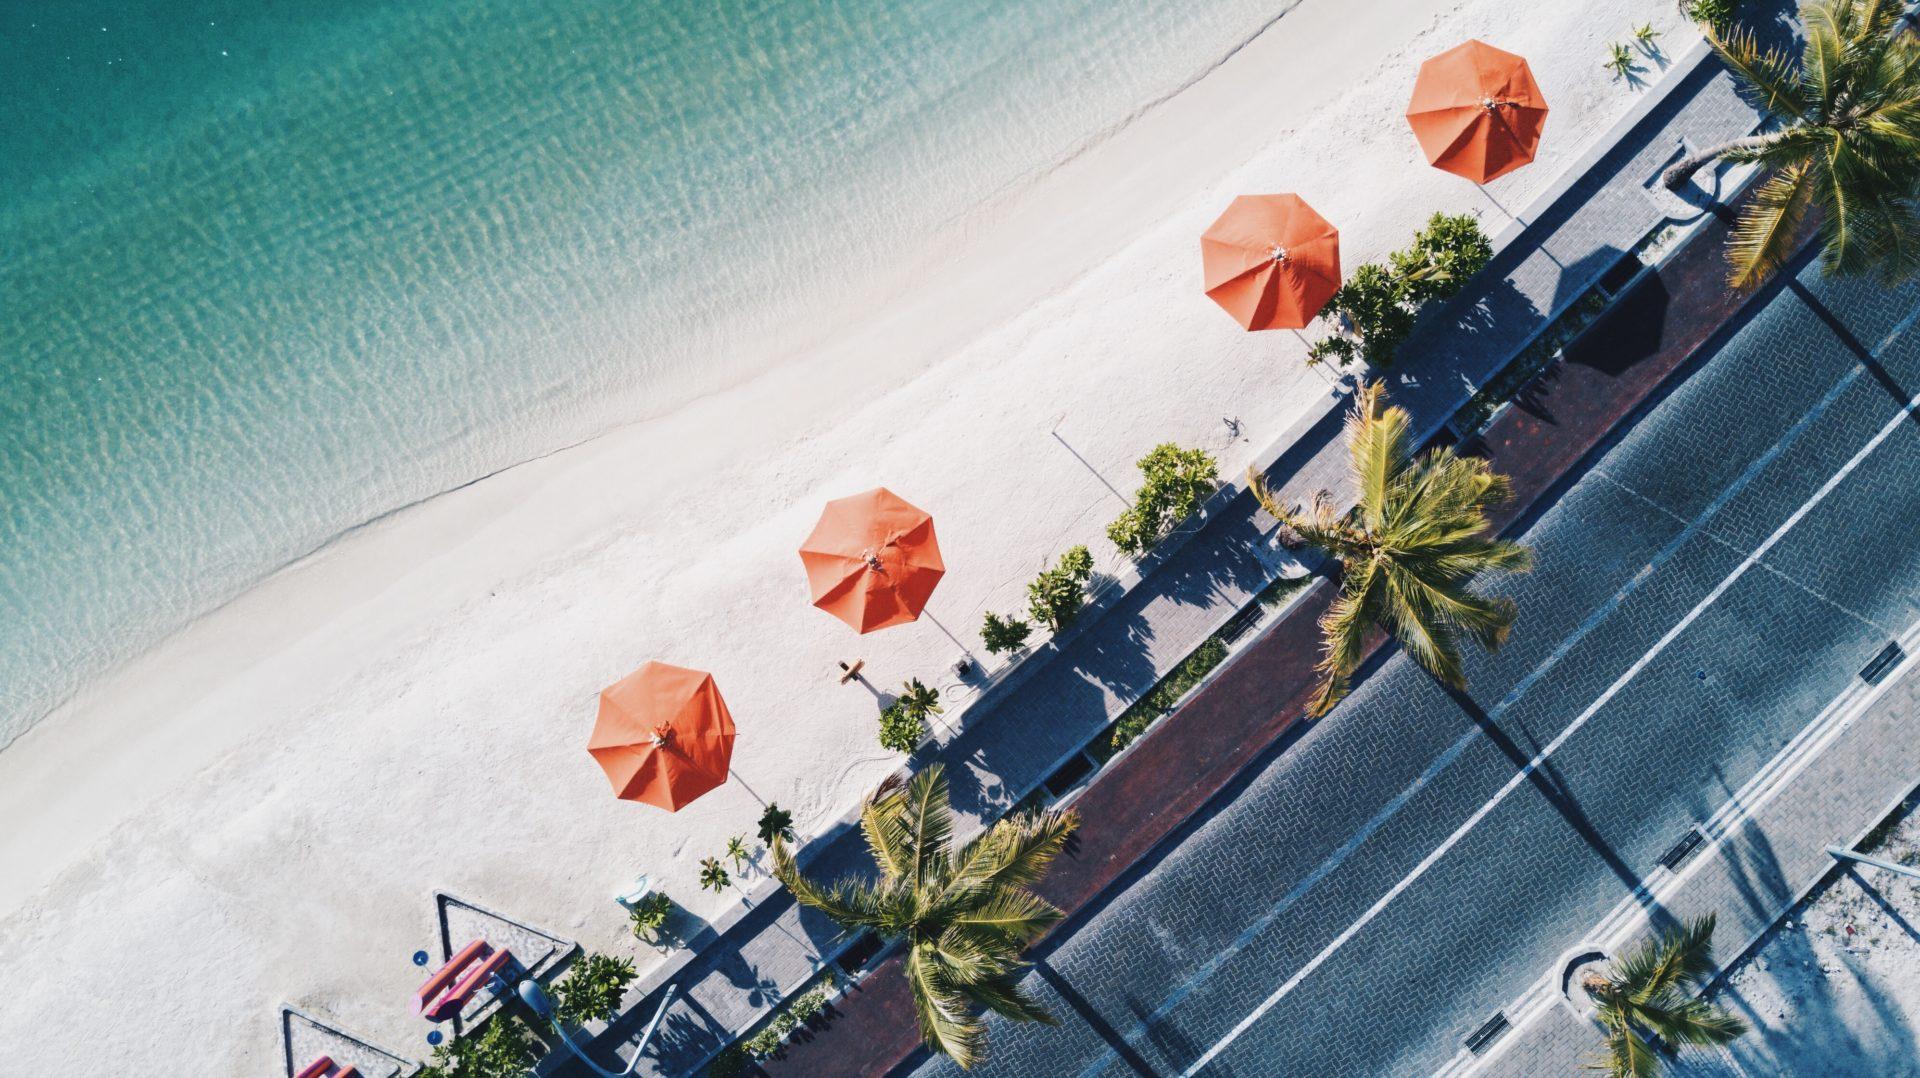 dron-vista-aerea-playa-recurso-bbva